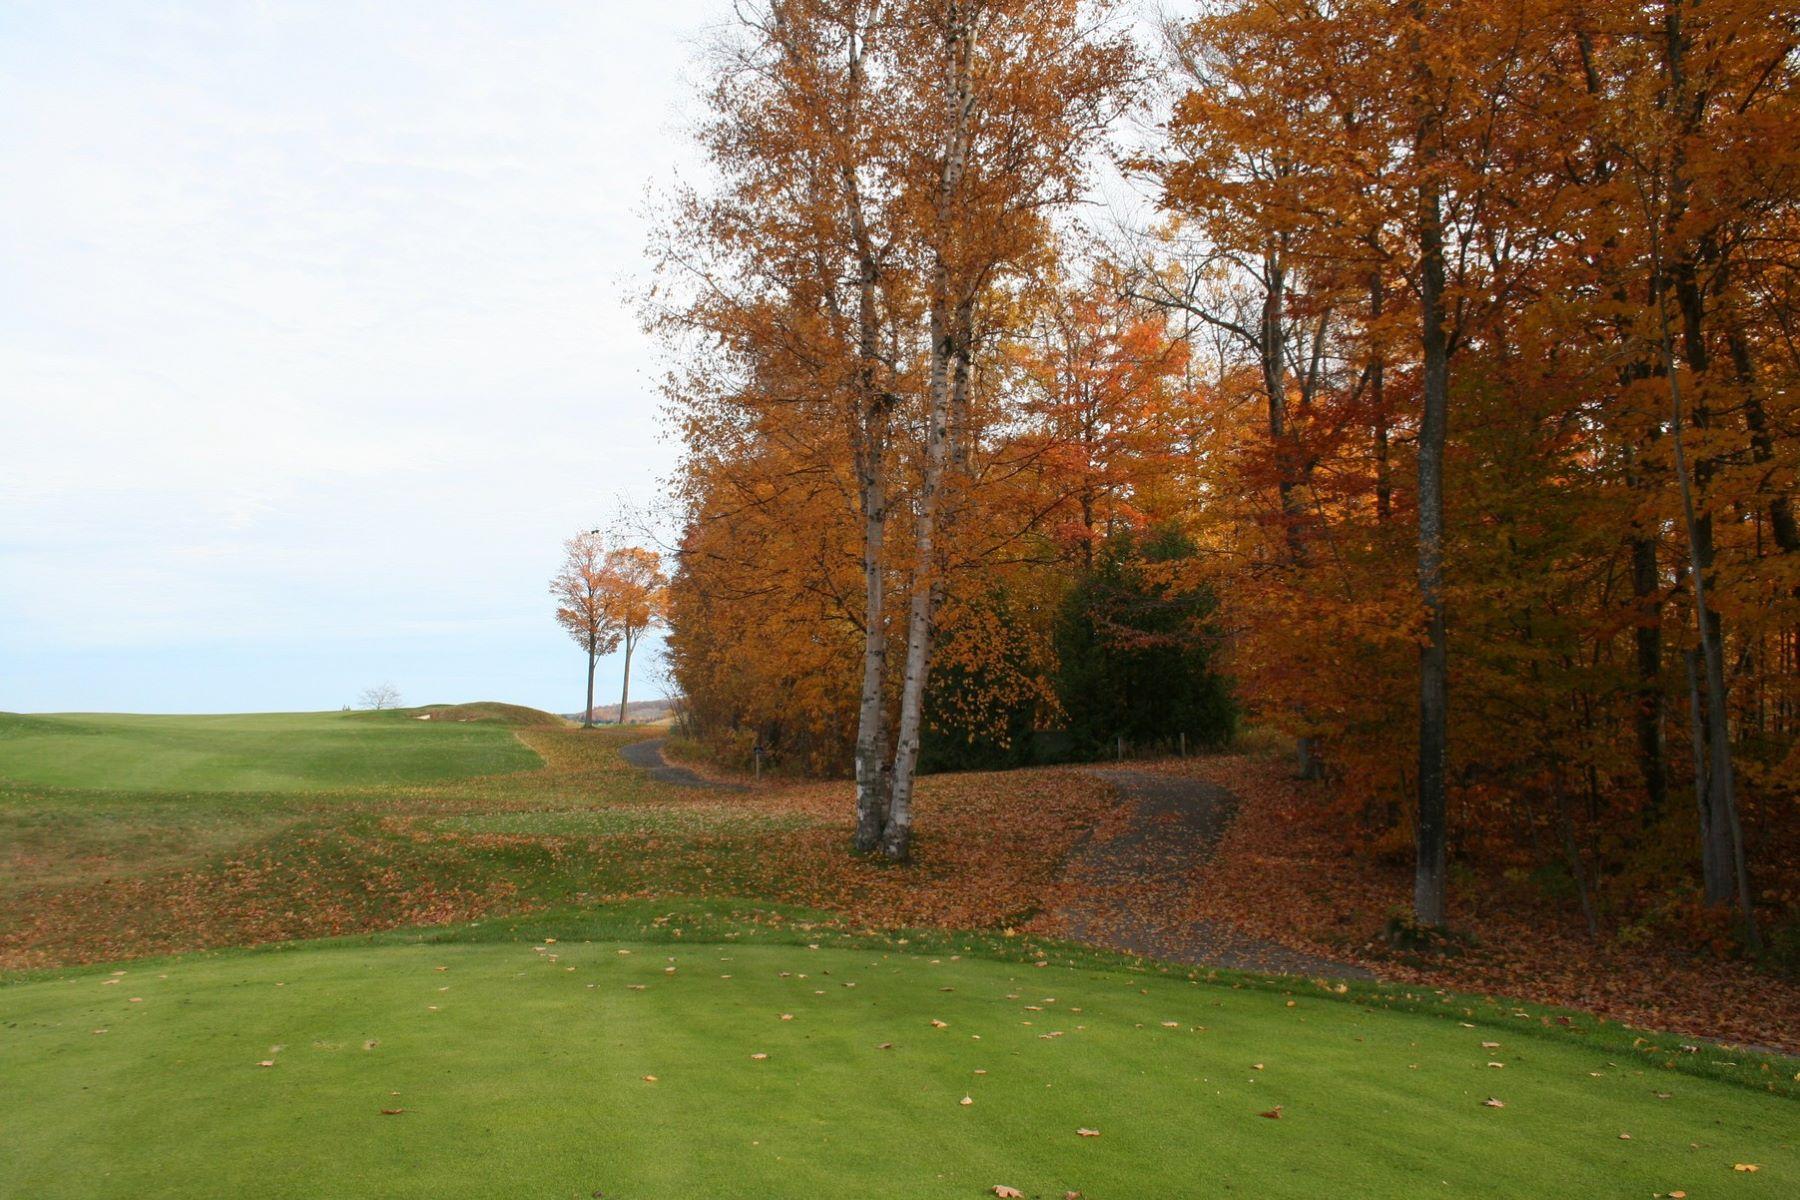 Additional photo for property listing at Coastal Woods 33 5694 Coastal Woods Court Bay Harbor, Michigan 49770 United States